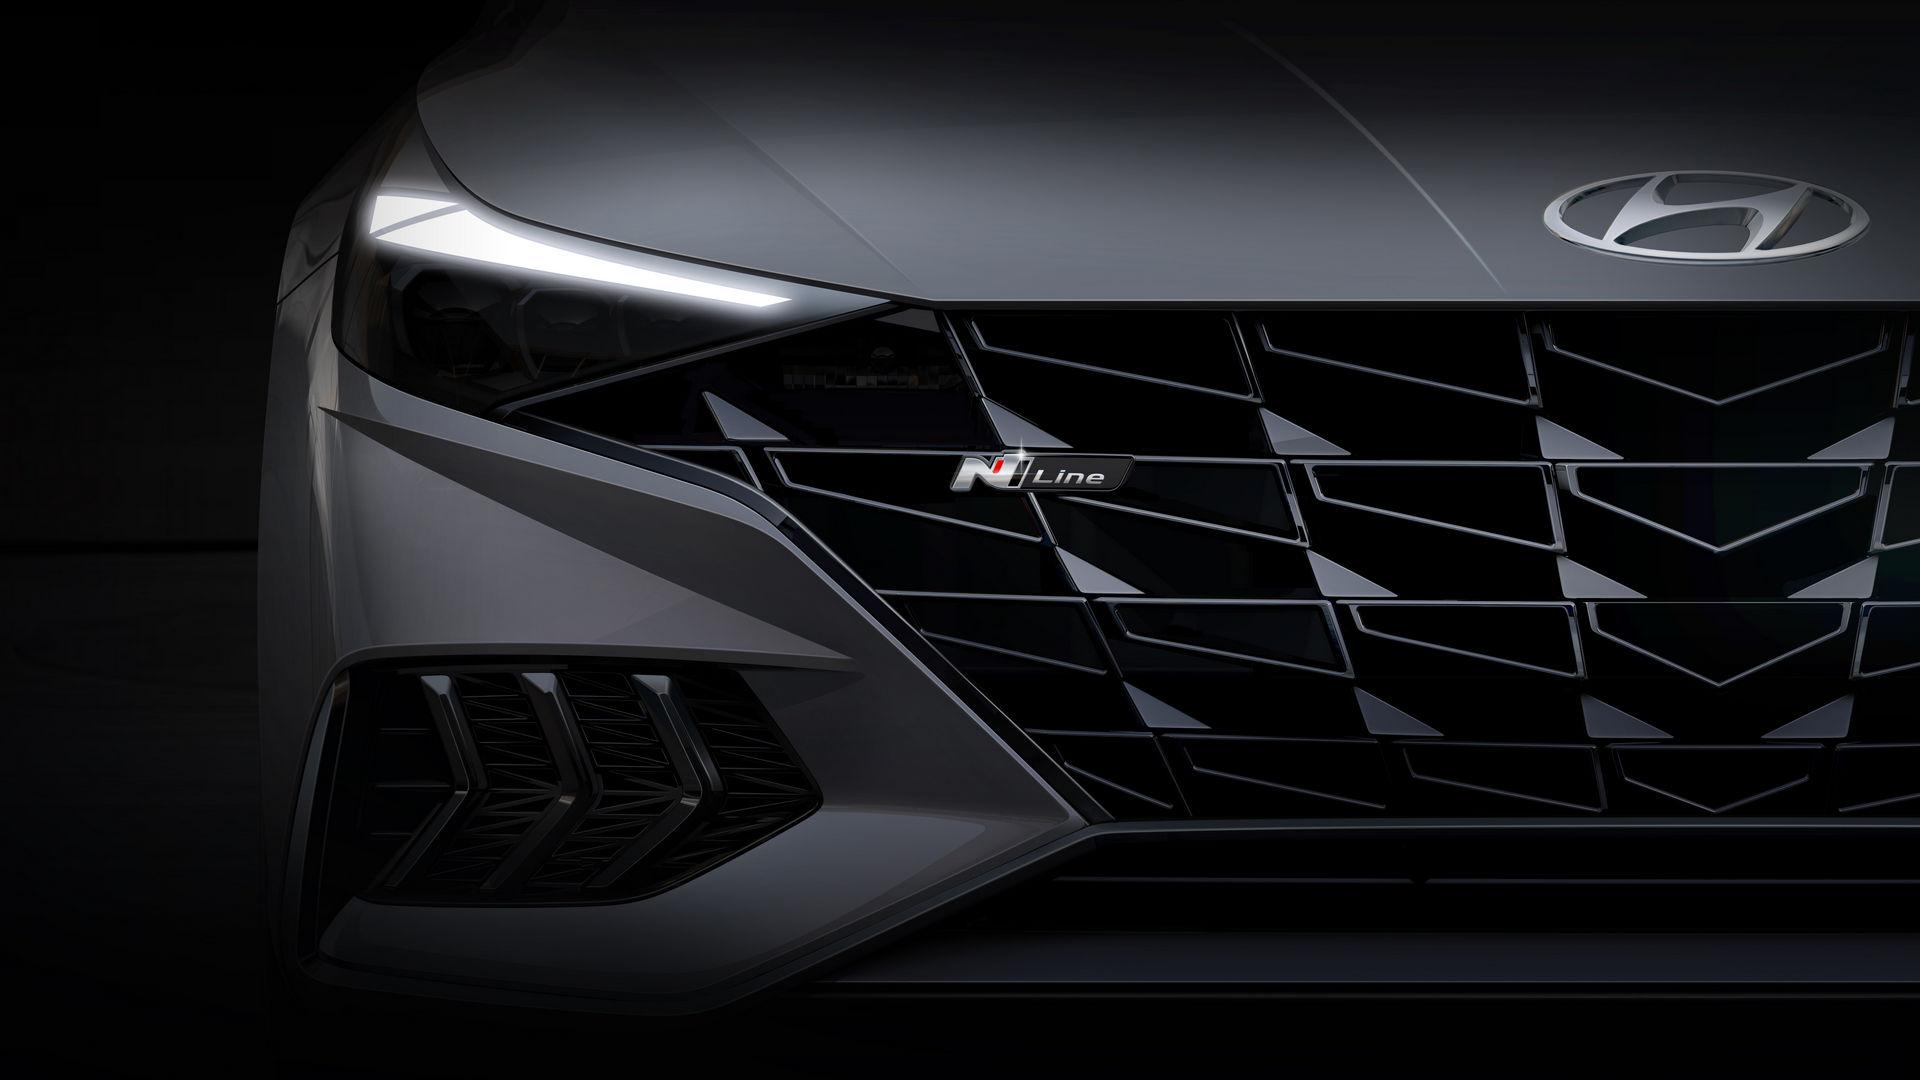 Hyundai-Elantra-N-Line-2021-4